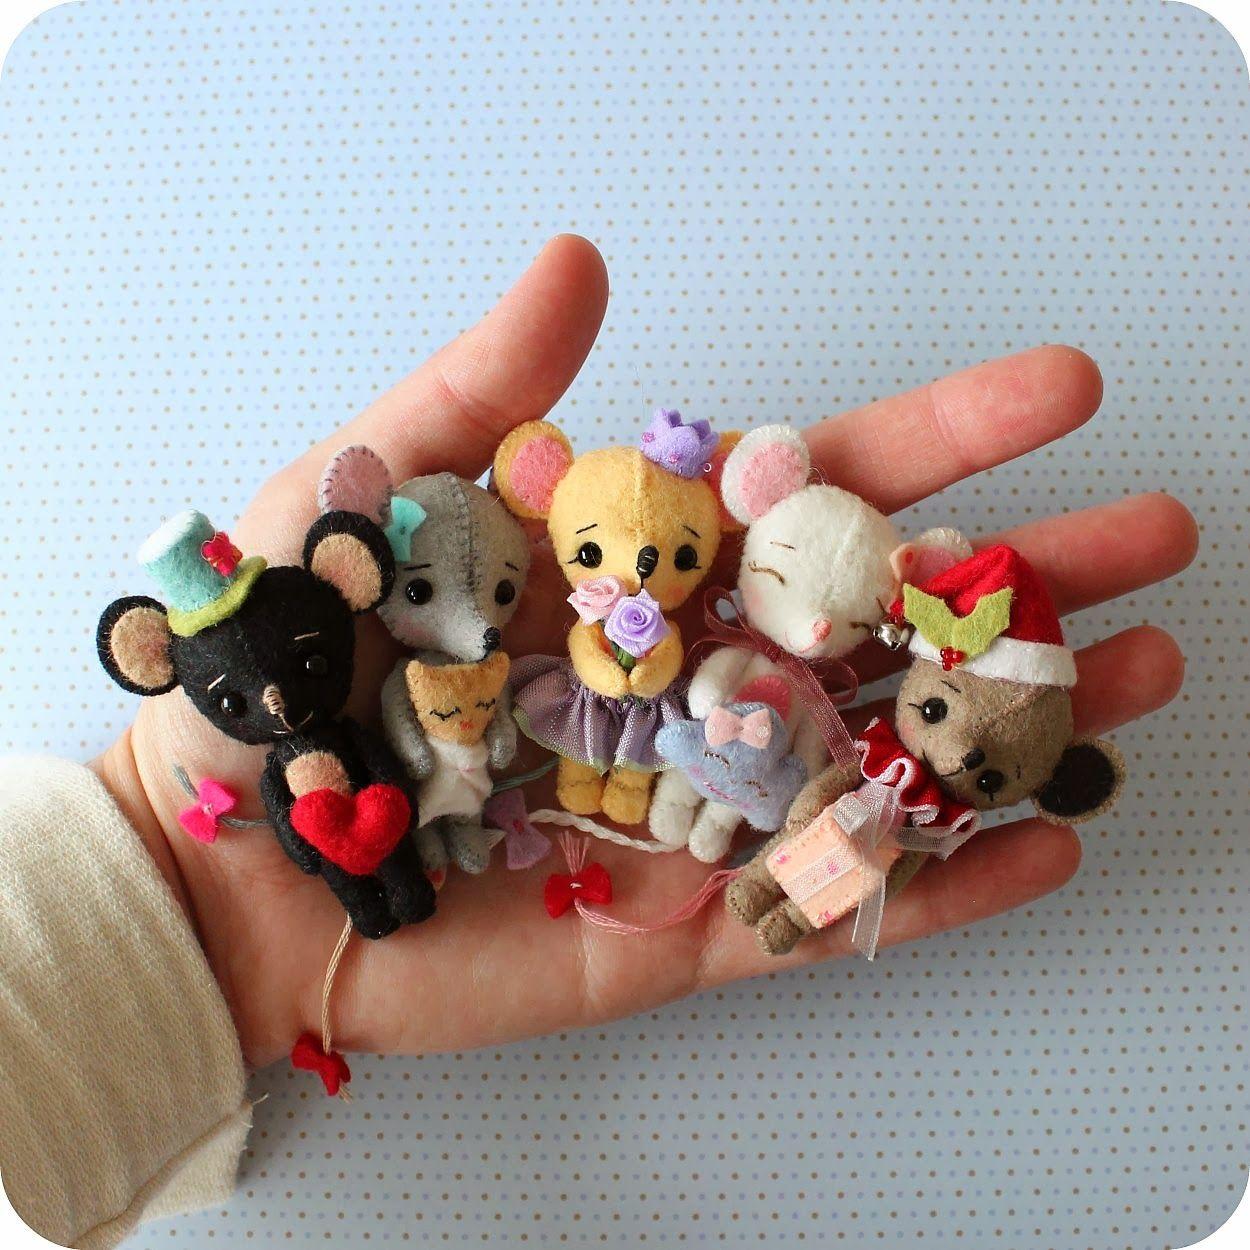 Exciting News! | Gingermelon, Homemade dolls, Felt dolls